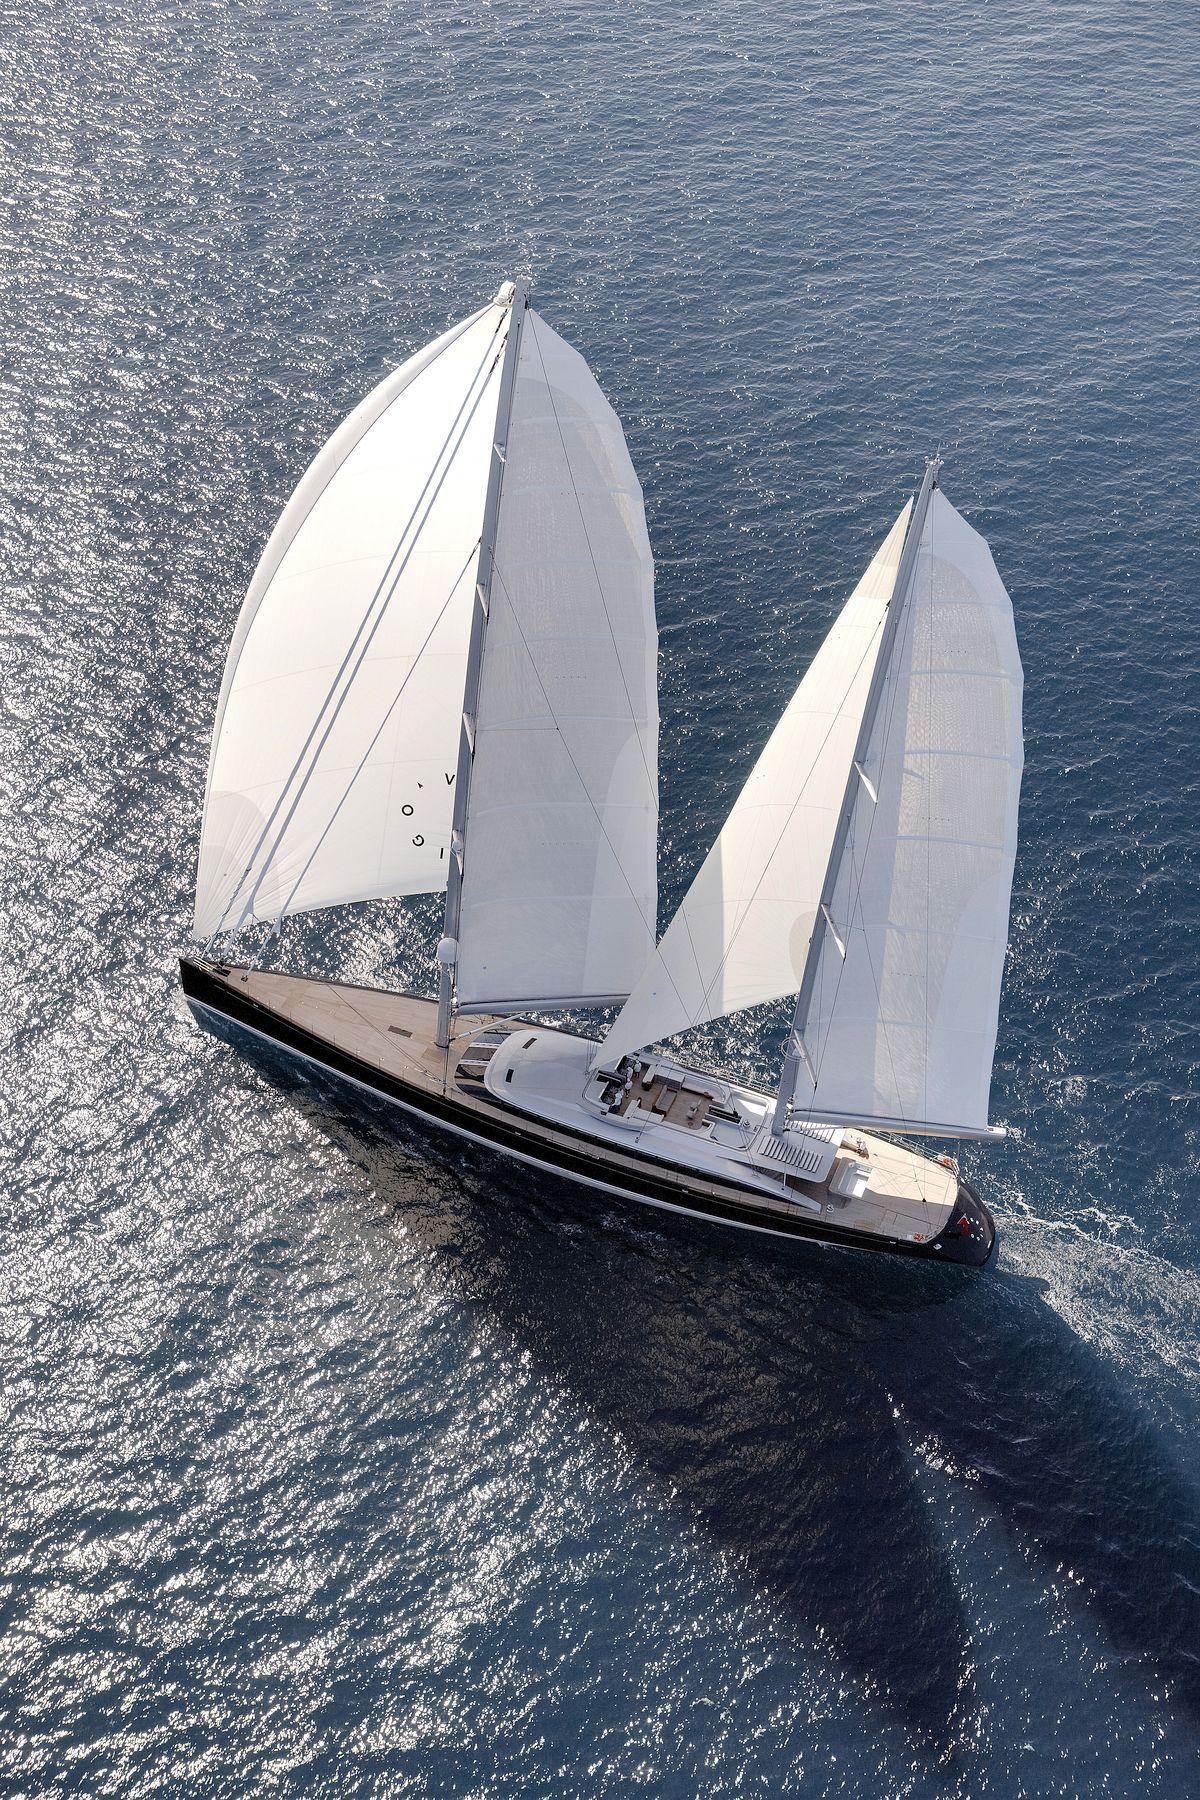 Vertigo Yacht Crowned Sailing Yacht Of The Year Boat Sailing Yacht Sailing